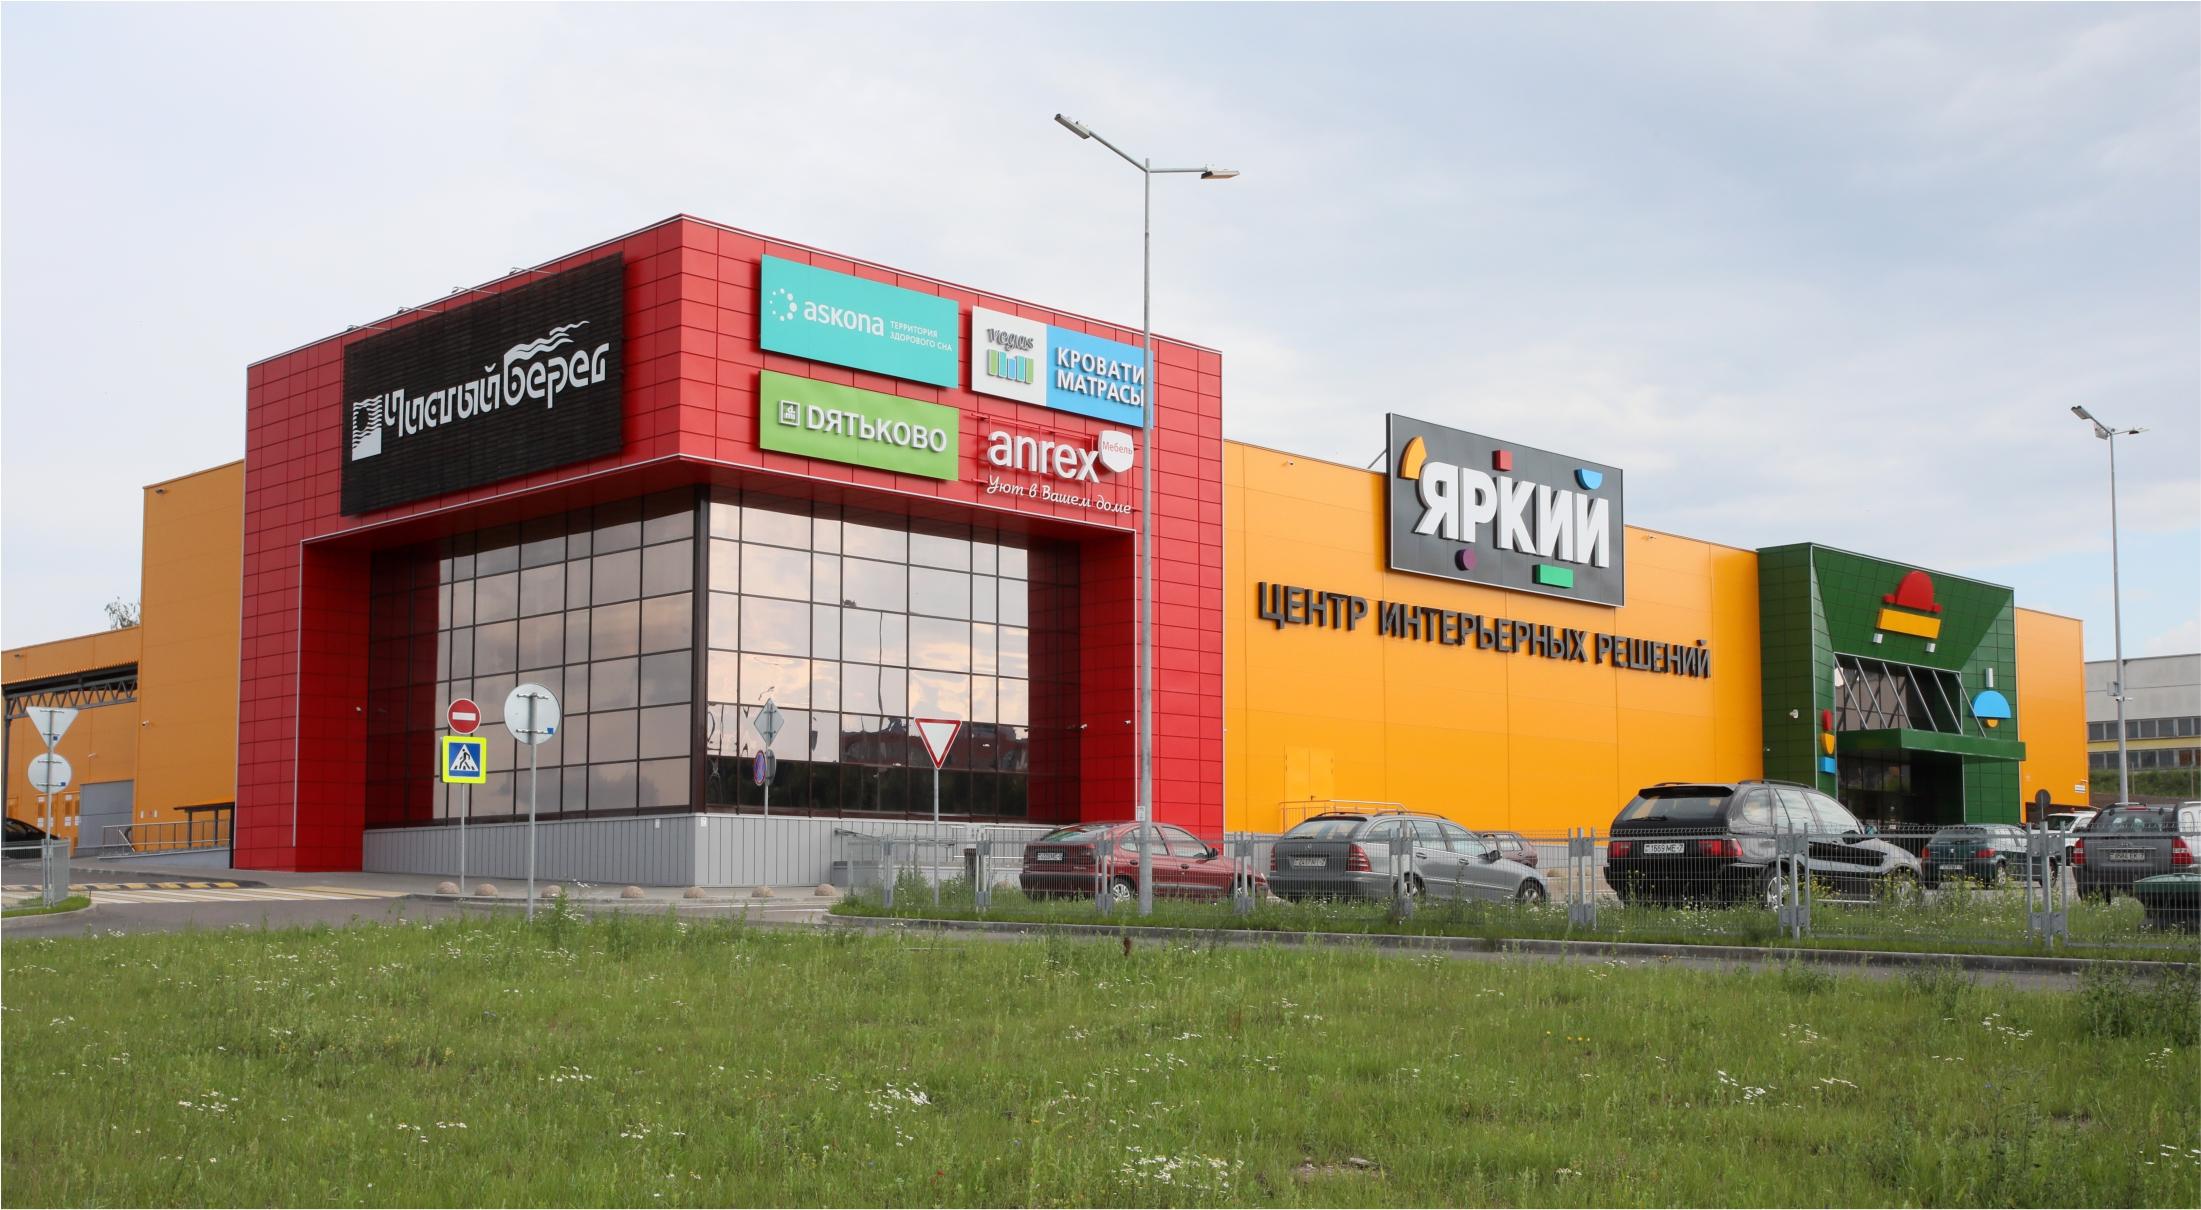 ТЦ «Яркий», г. Минск 3232